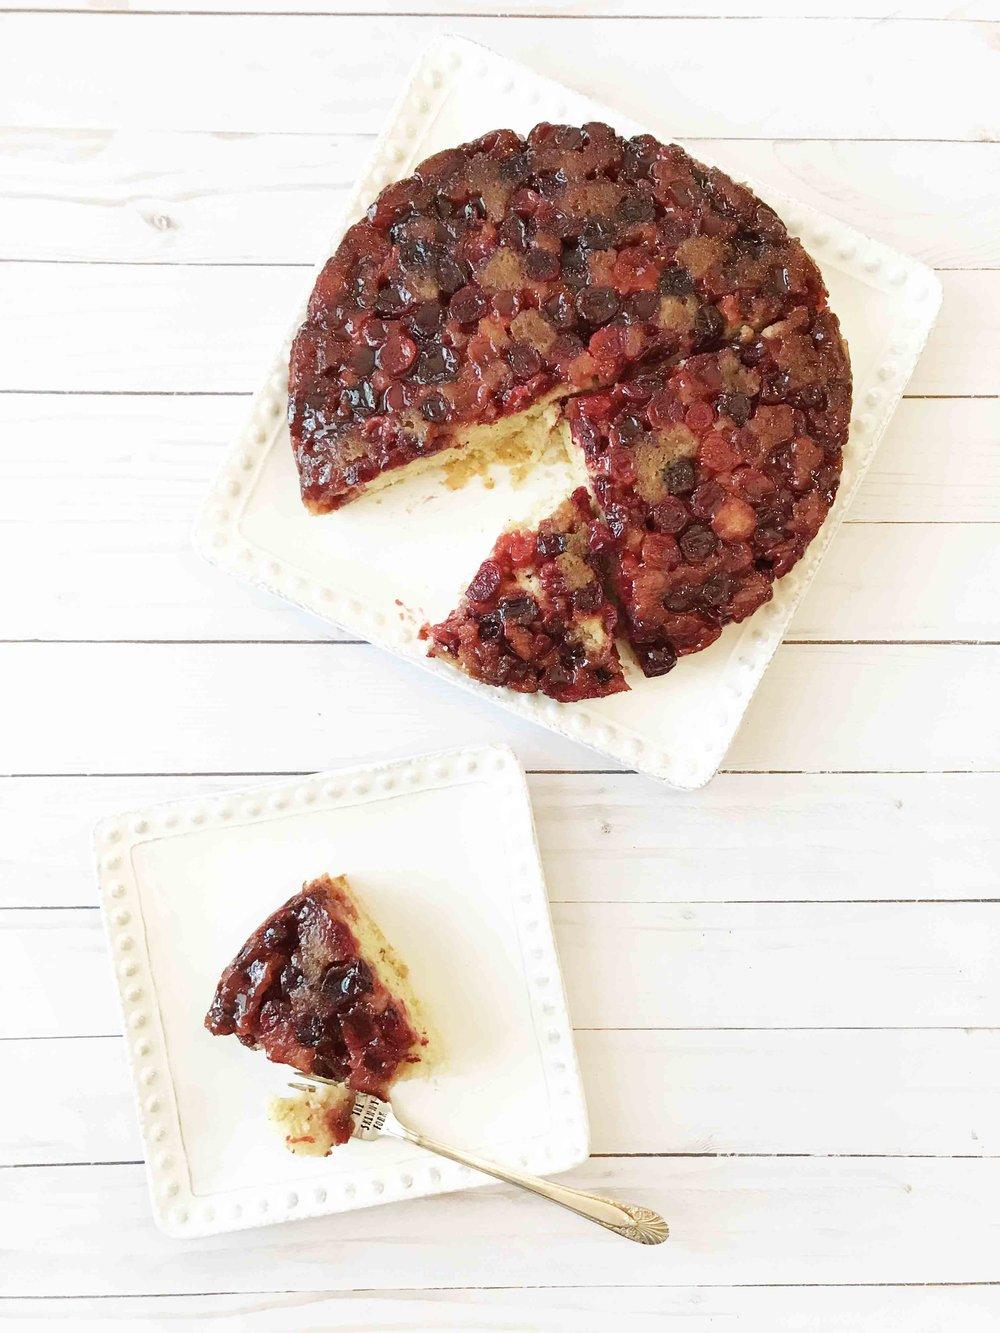 cranberry-upside-down-cake2.jpg